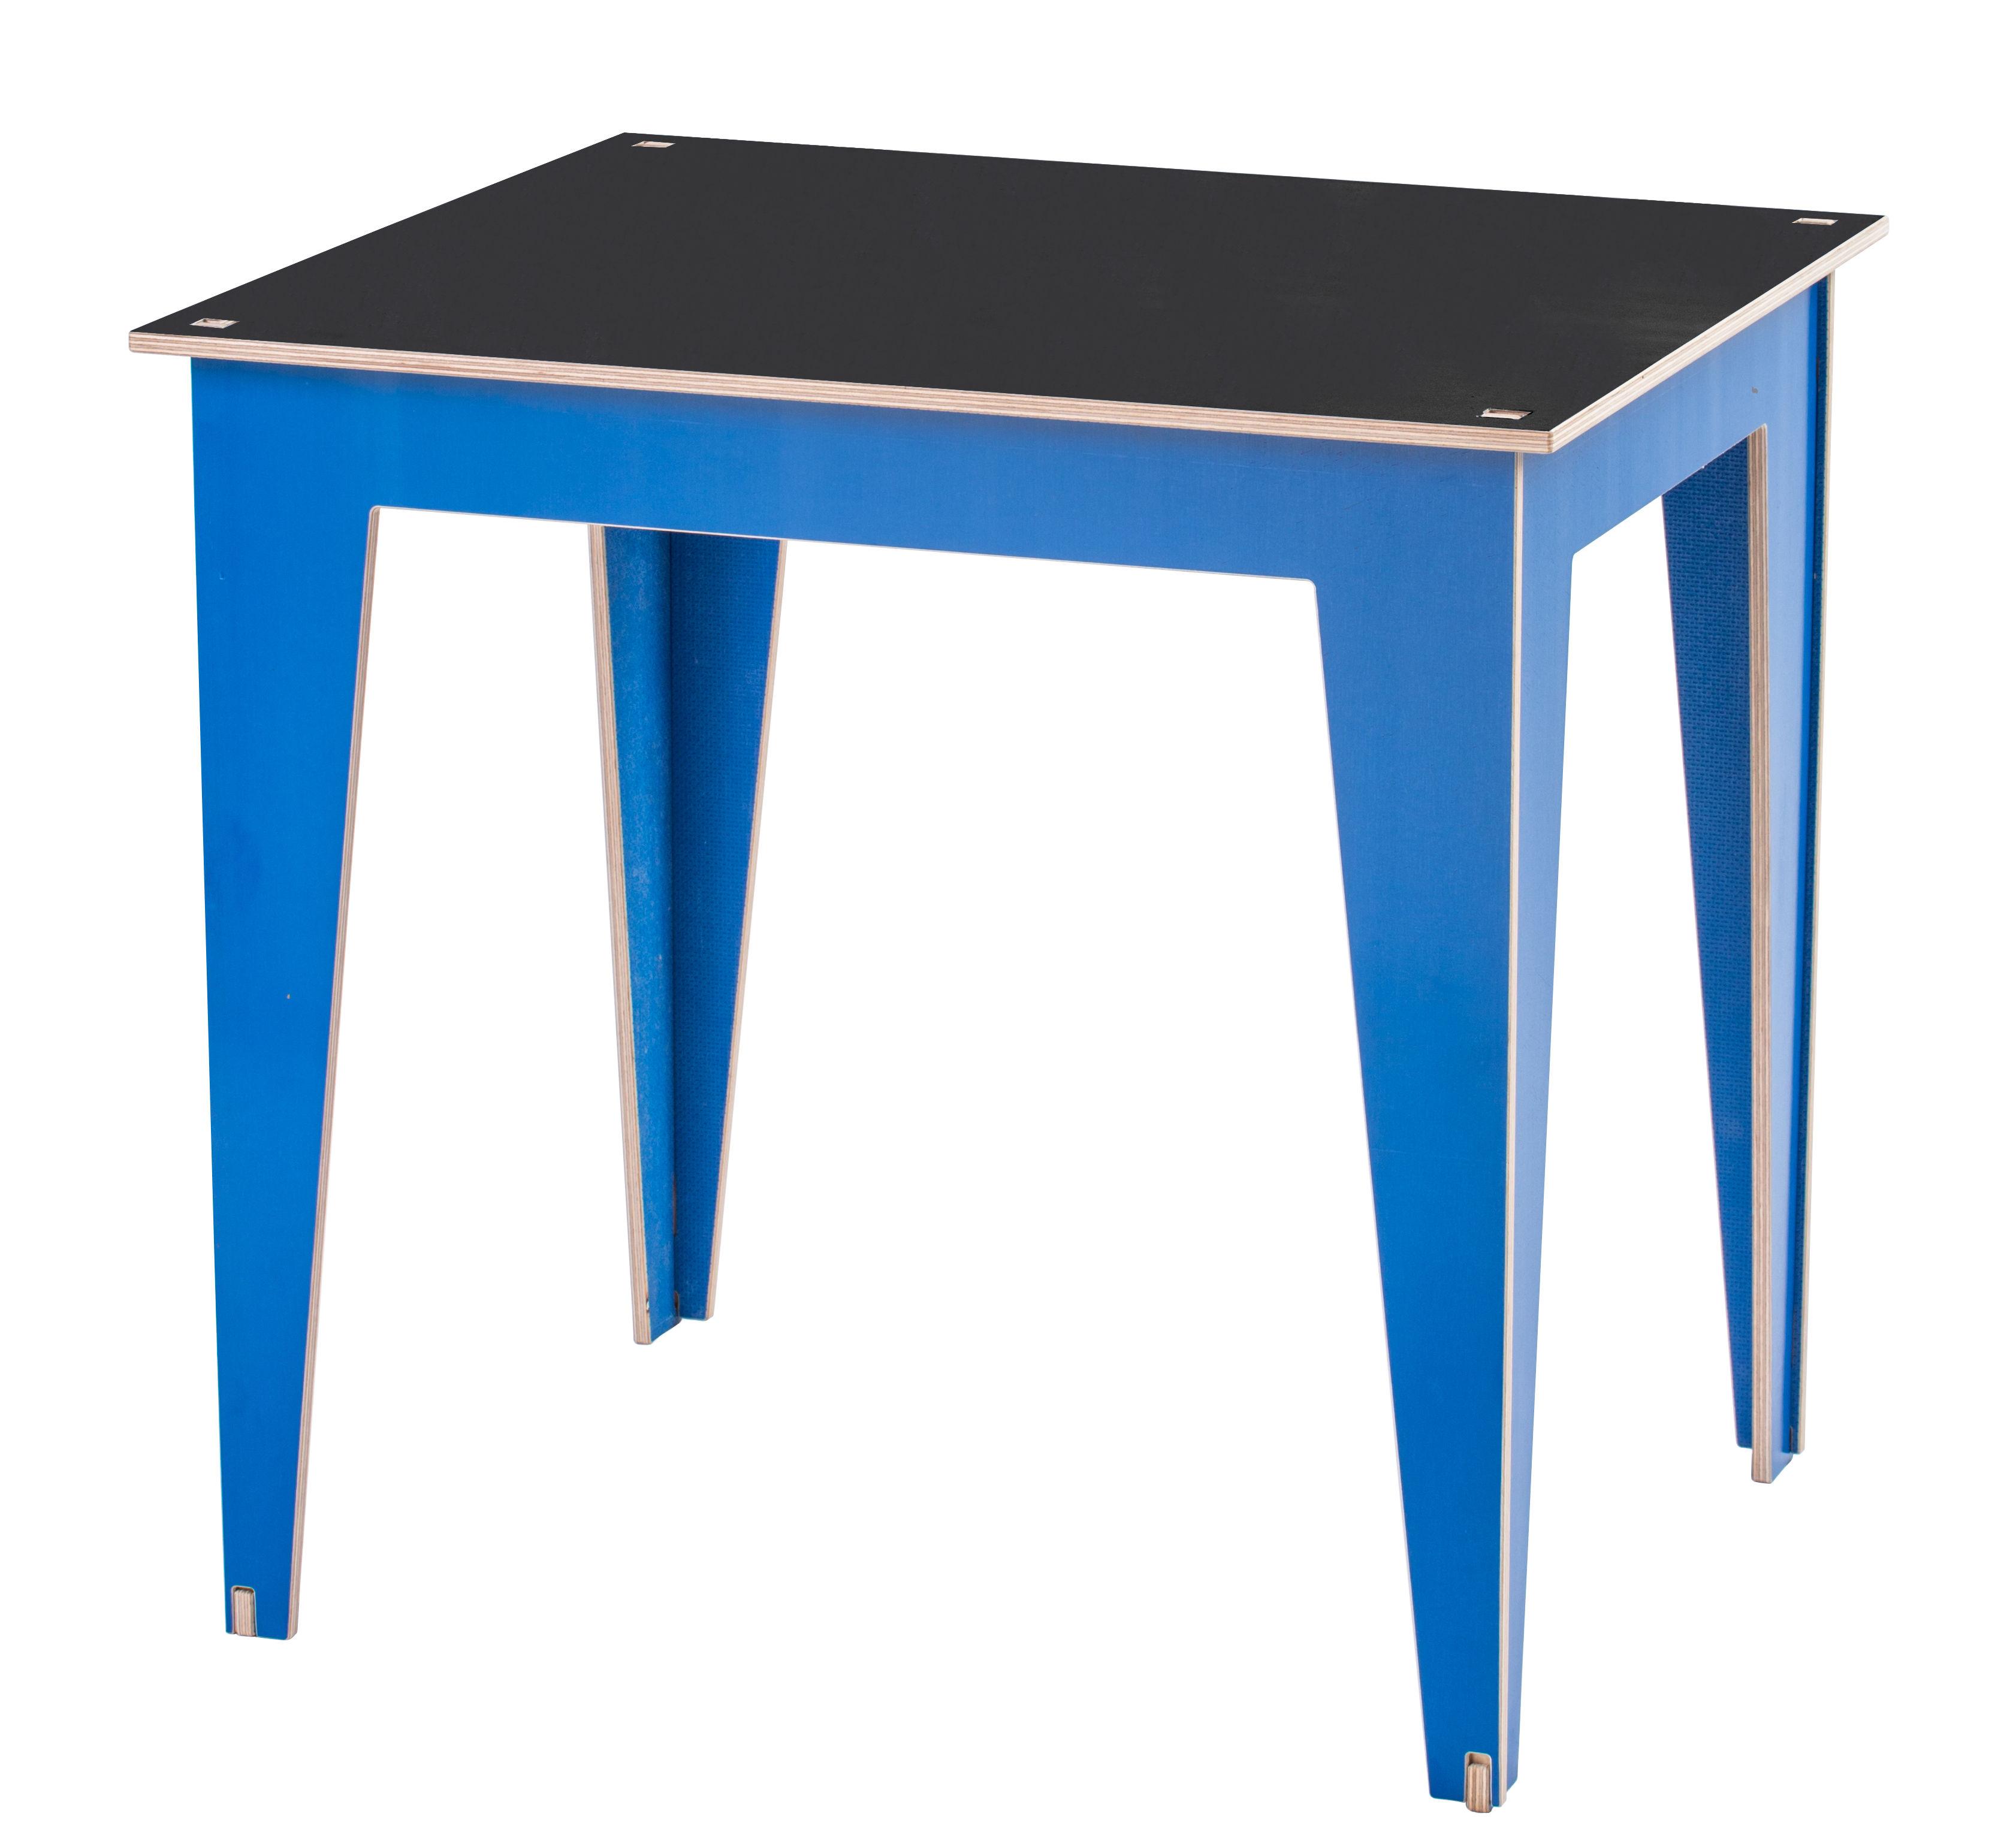 Table enfant Kidiki / Plateau ardoise Ardoise noire / Pieds bleus ...